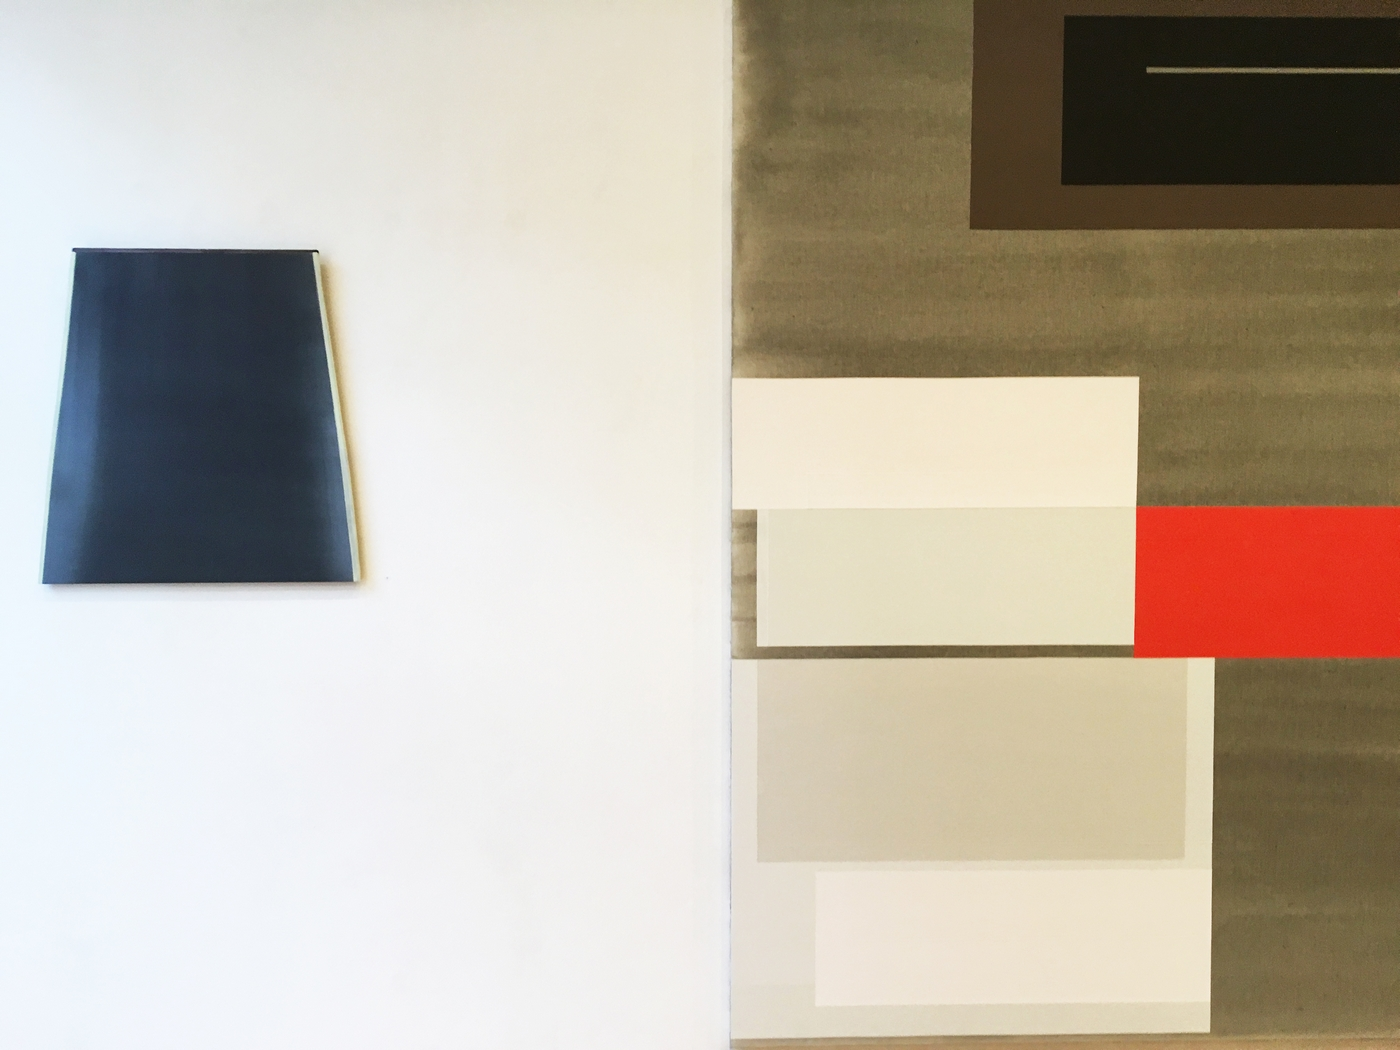 Marena Seeling, wallobject. Inez Smit, painting [detail]